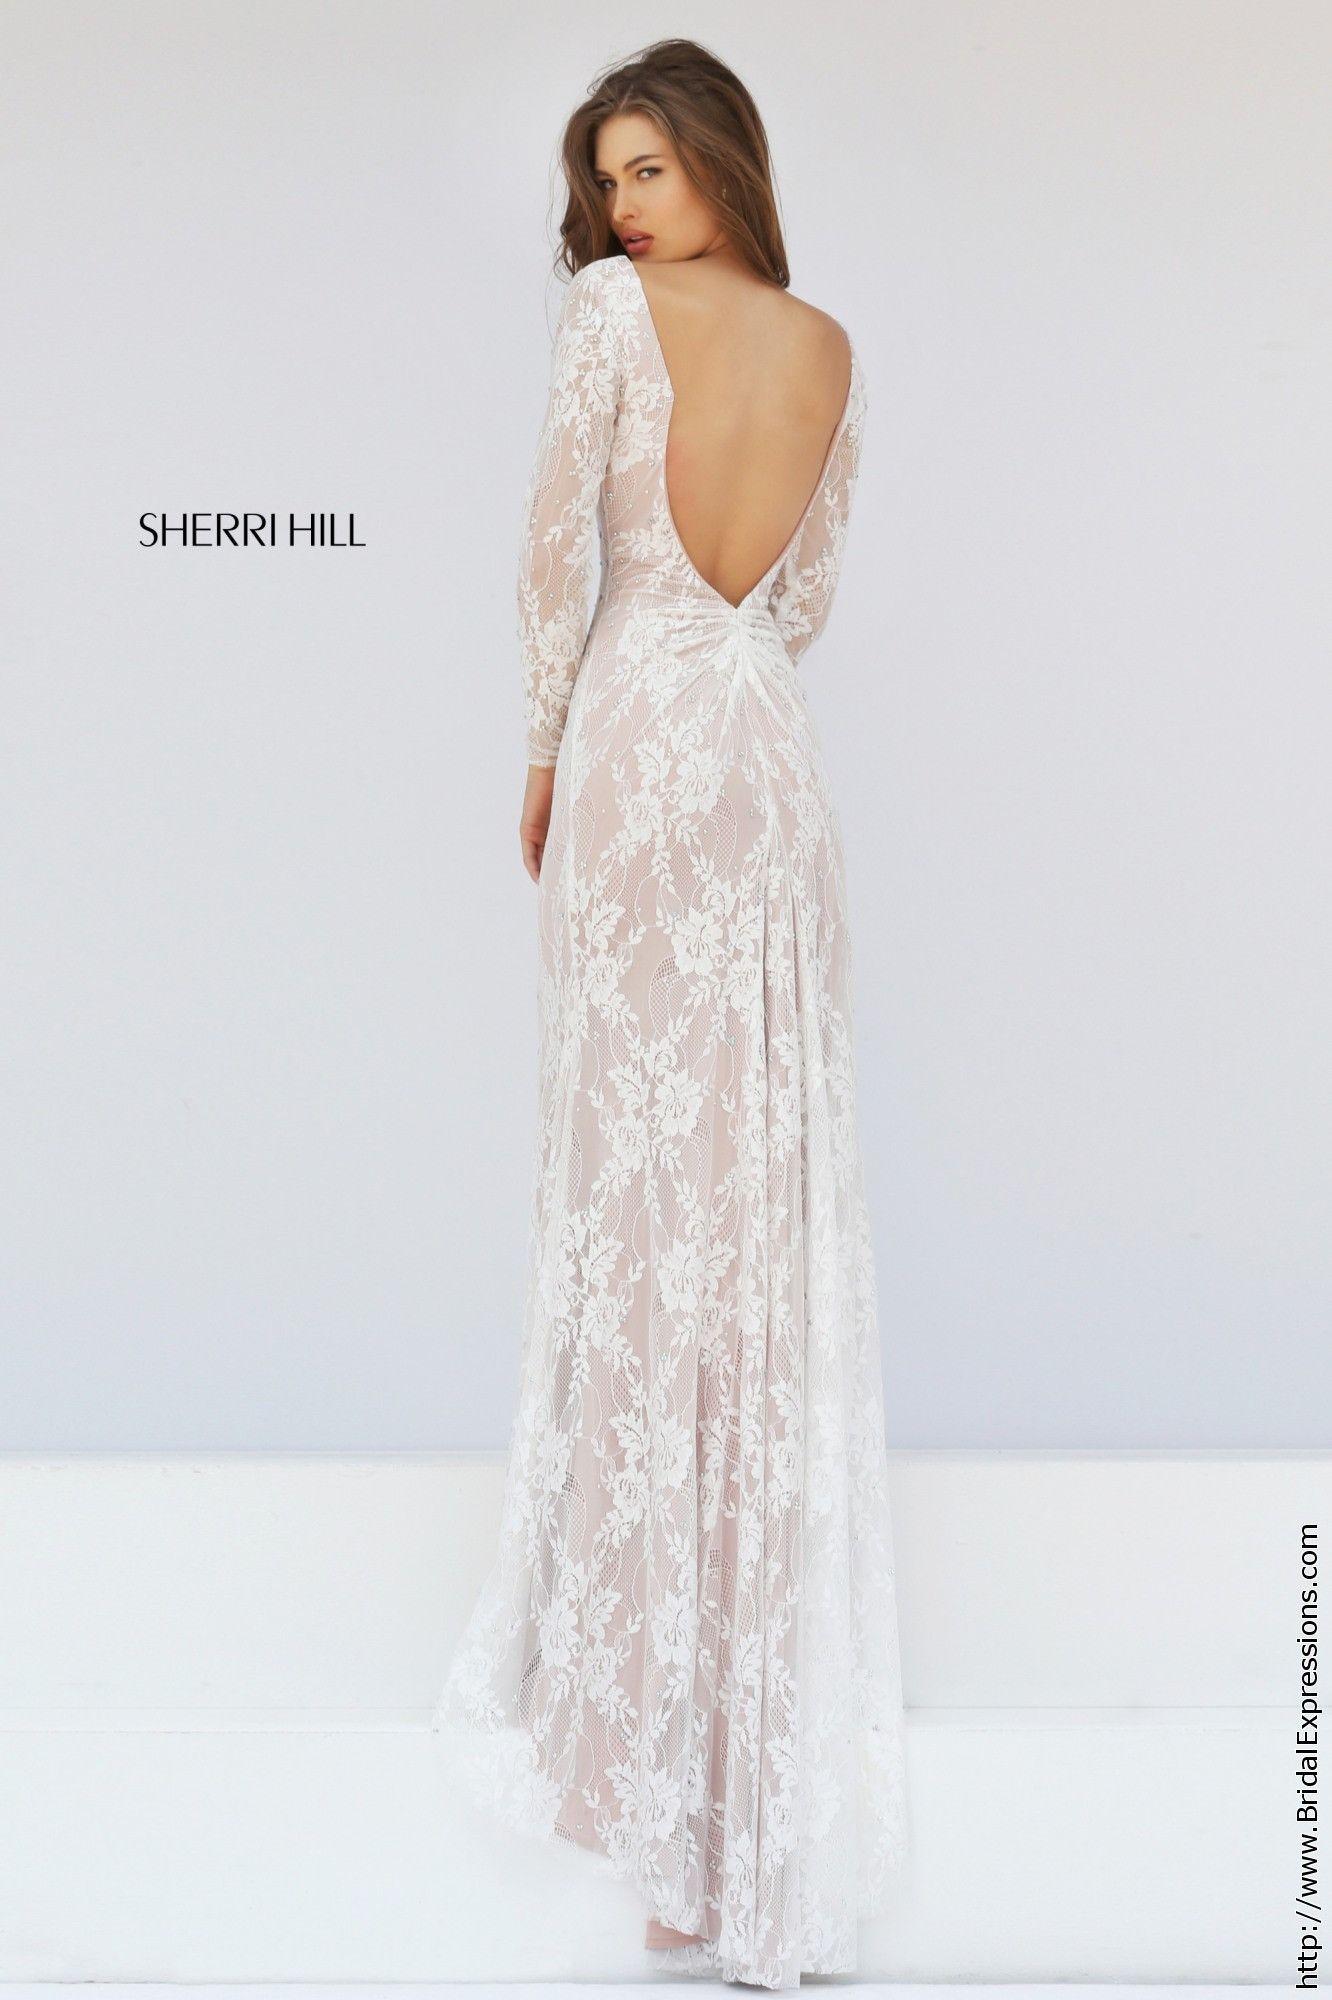 Sherri Hill 50019 Long Sleeve Stretch Lace Prom Dress